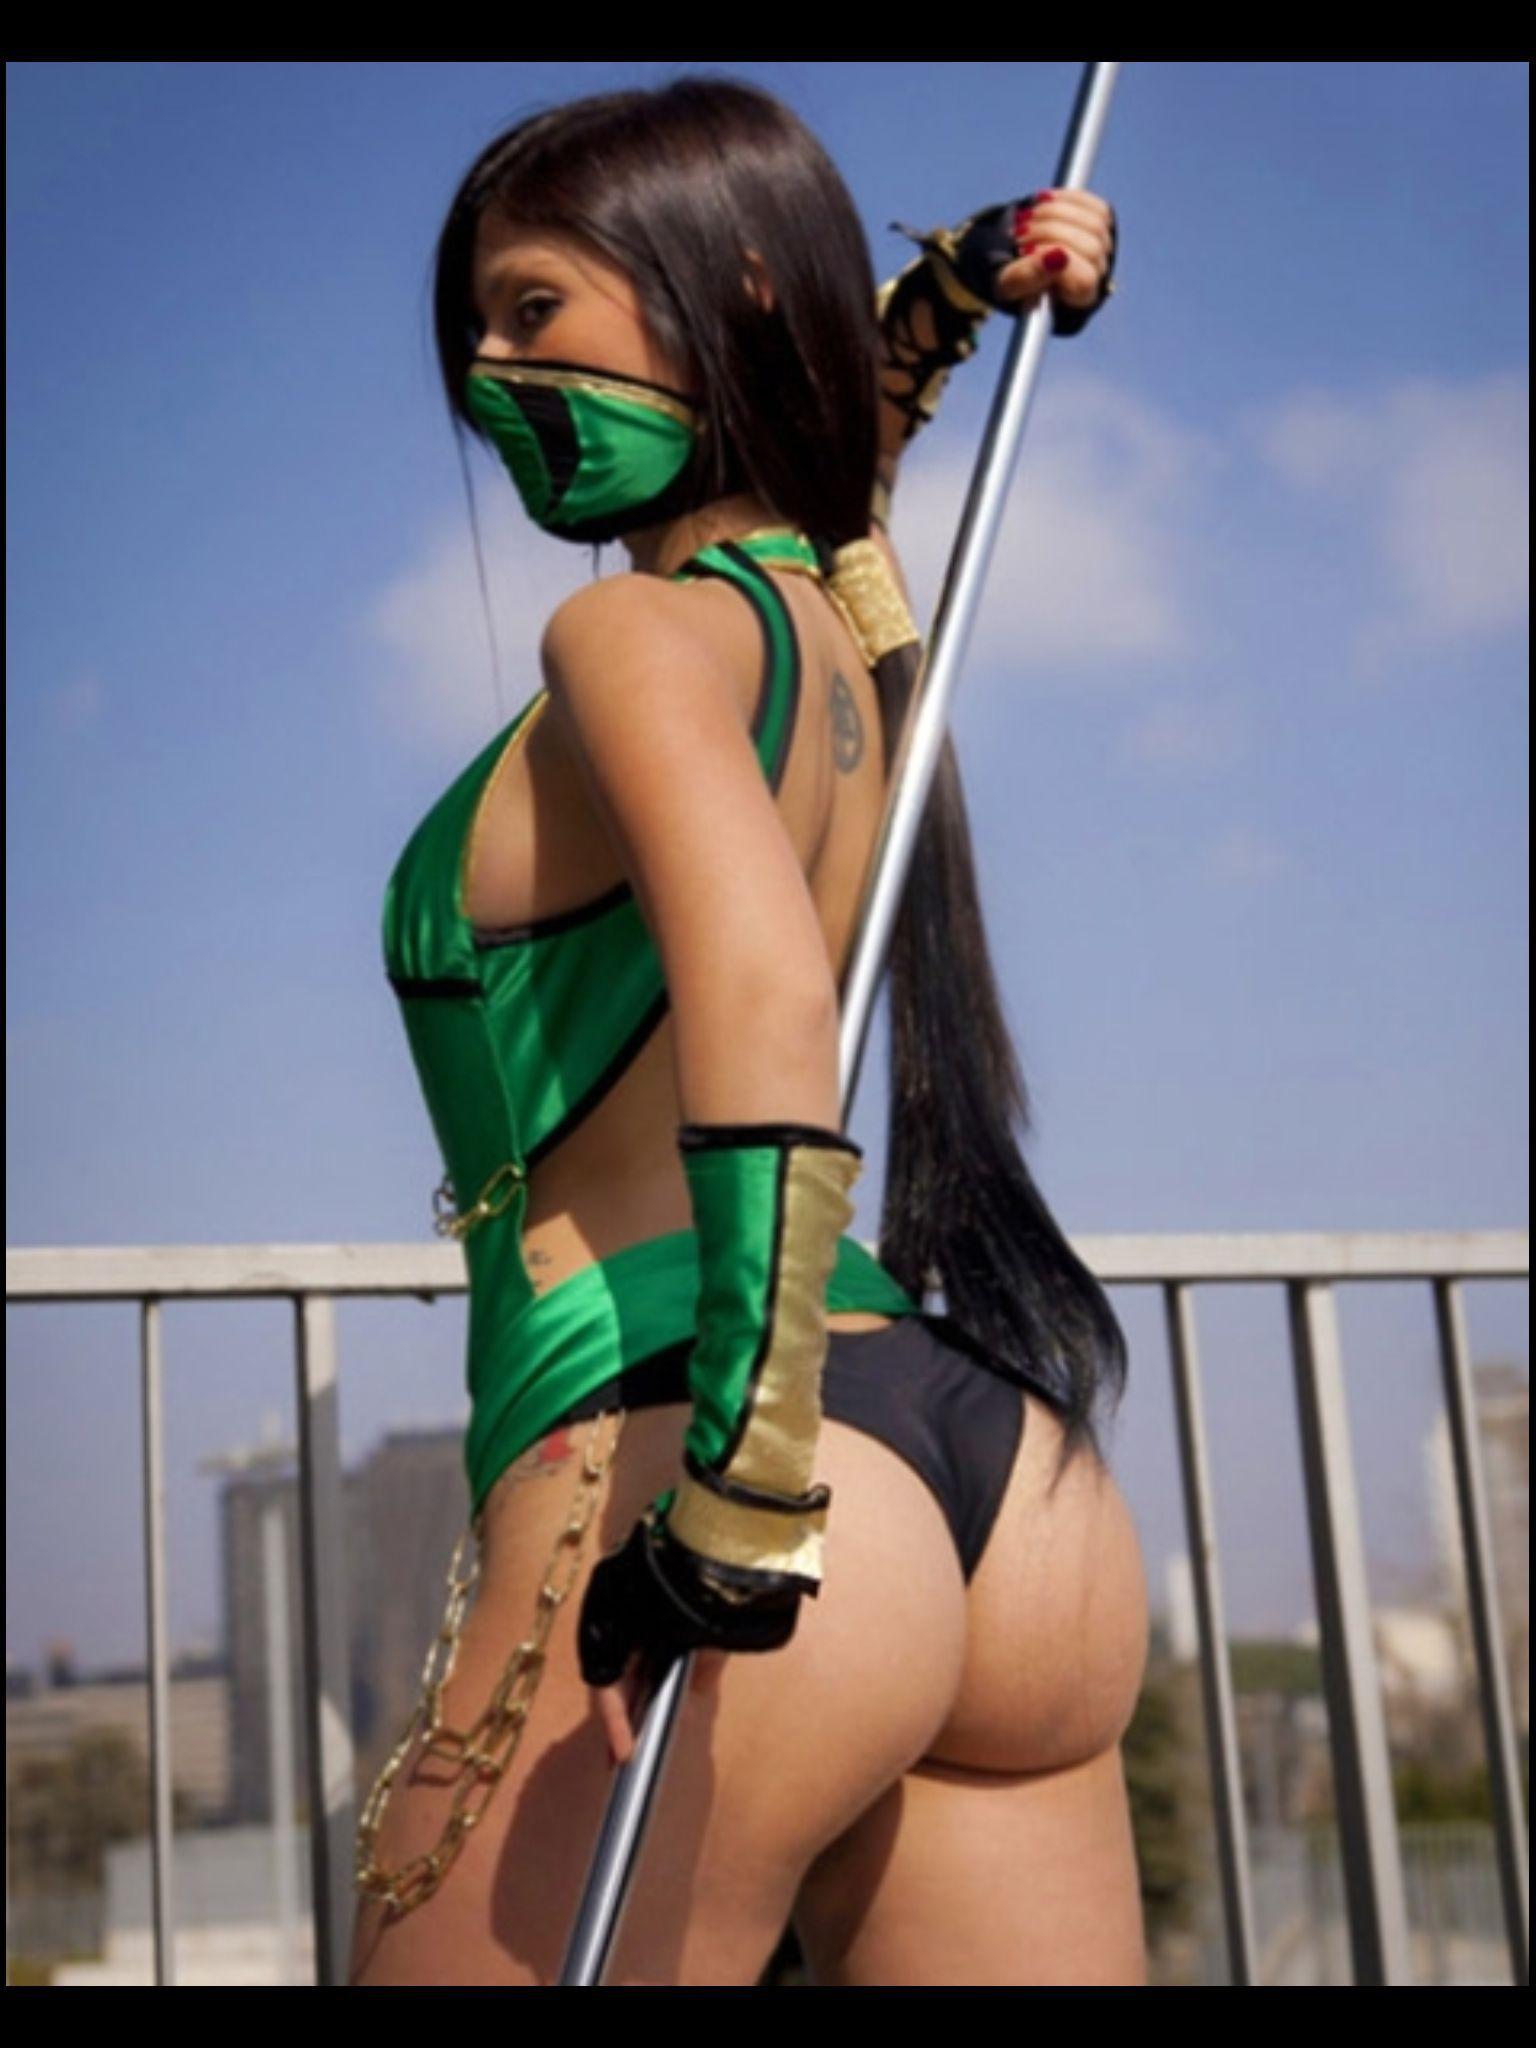 Sexy Superhero Hot Girls Jade On Mortal Kombat  Hot Girl -6121